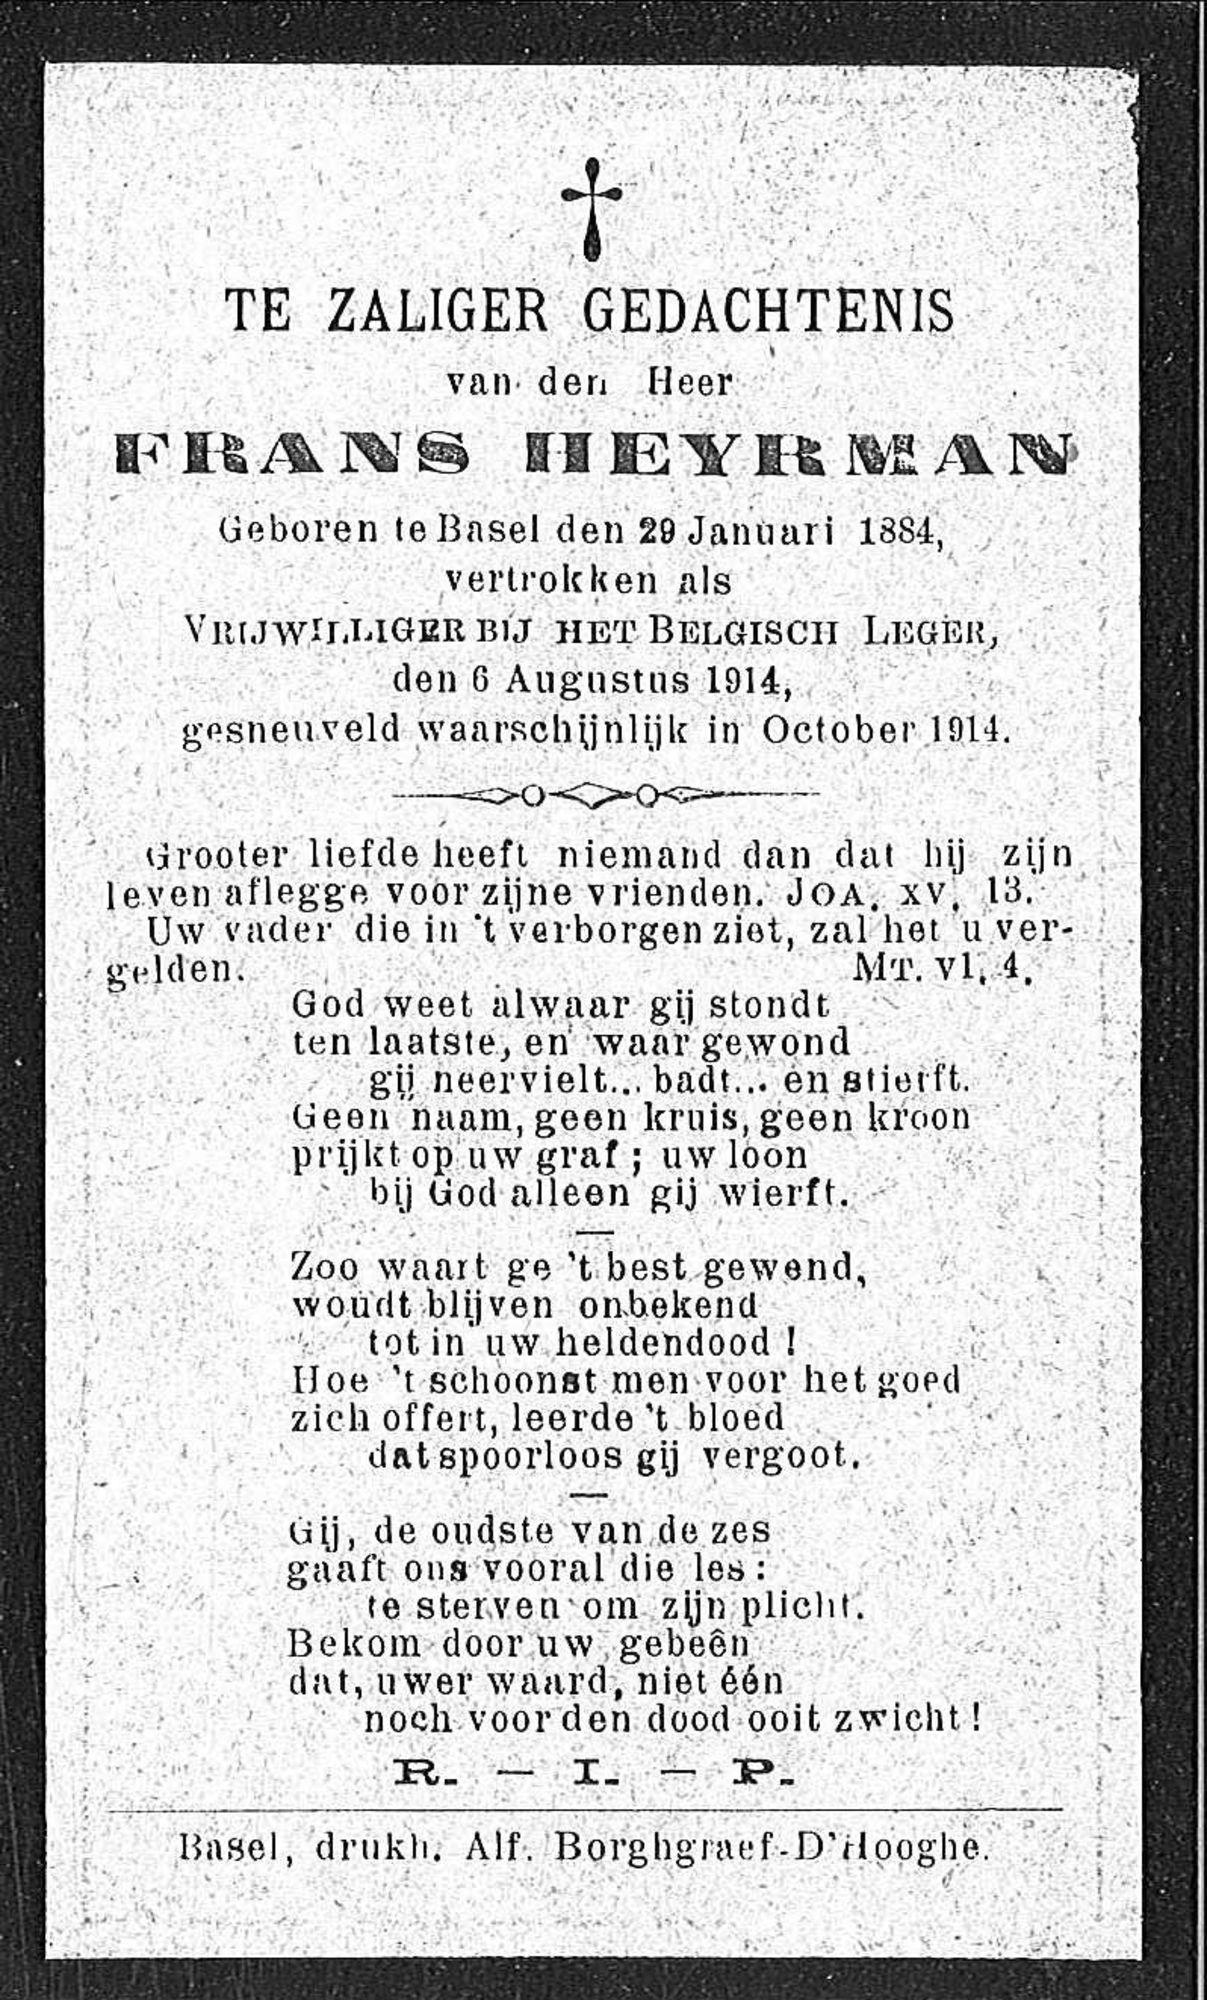 Frans Heyrman